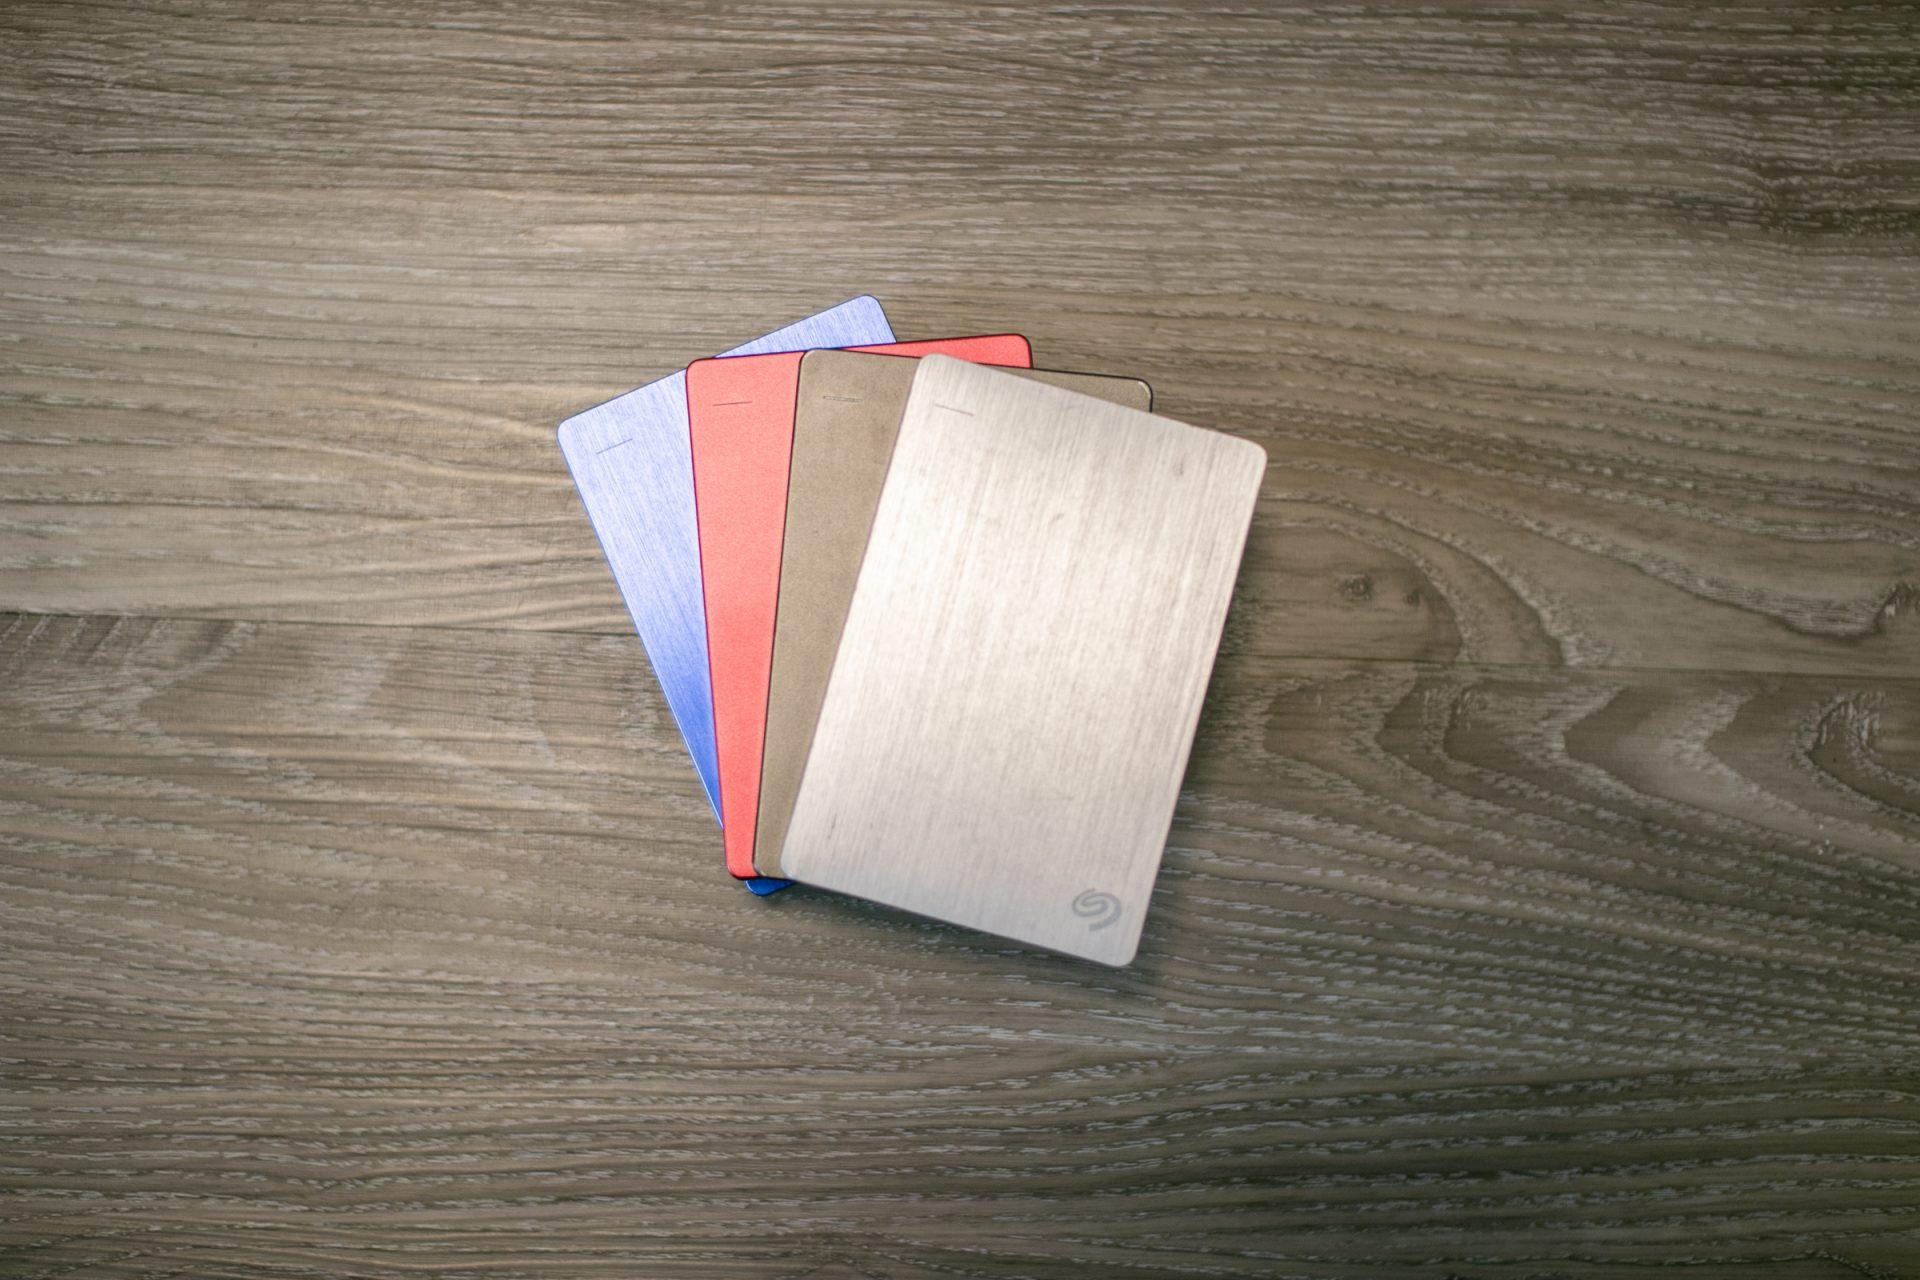 Four External Hard Disks On Wooden Surface